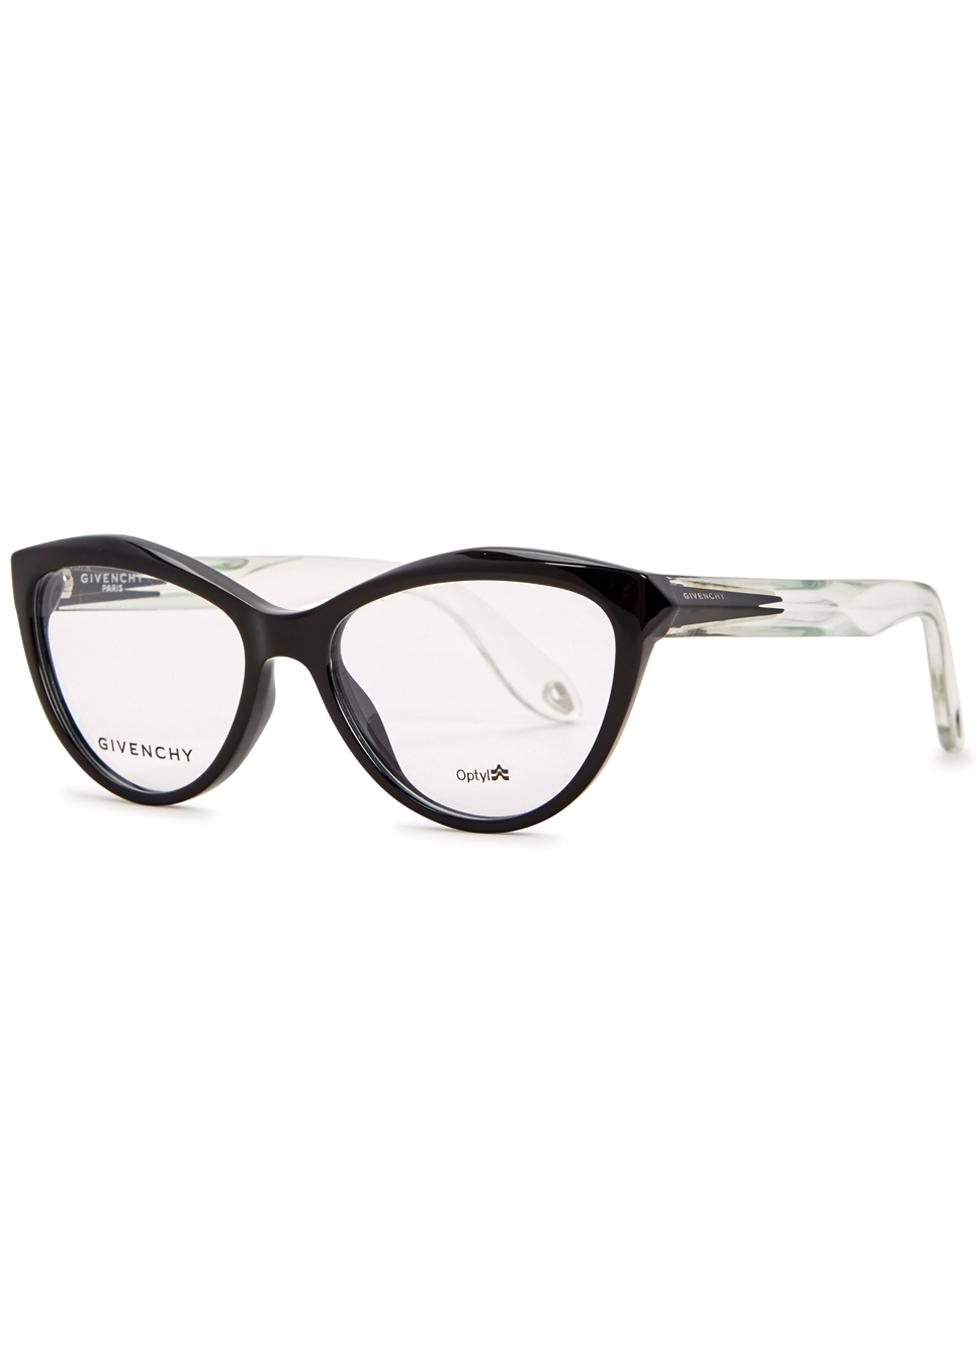 Black cat-eye optical glasses - Givenchy